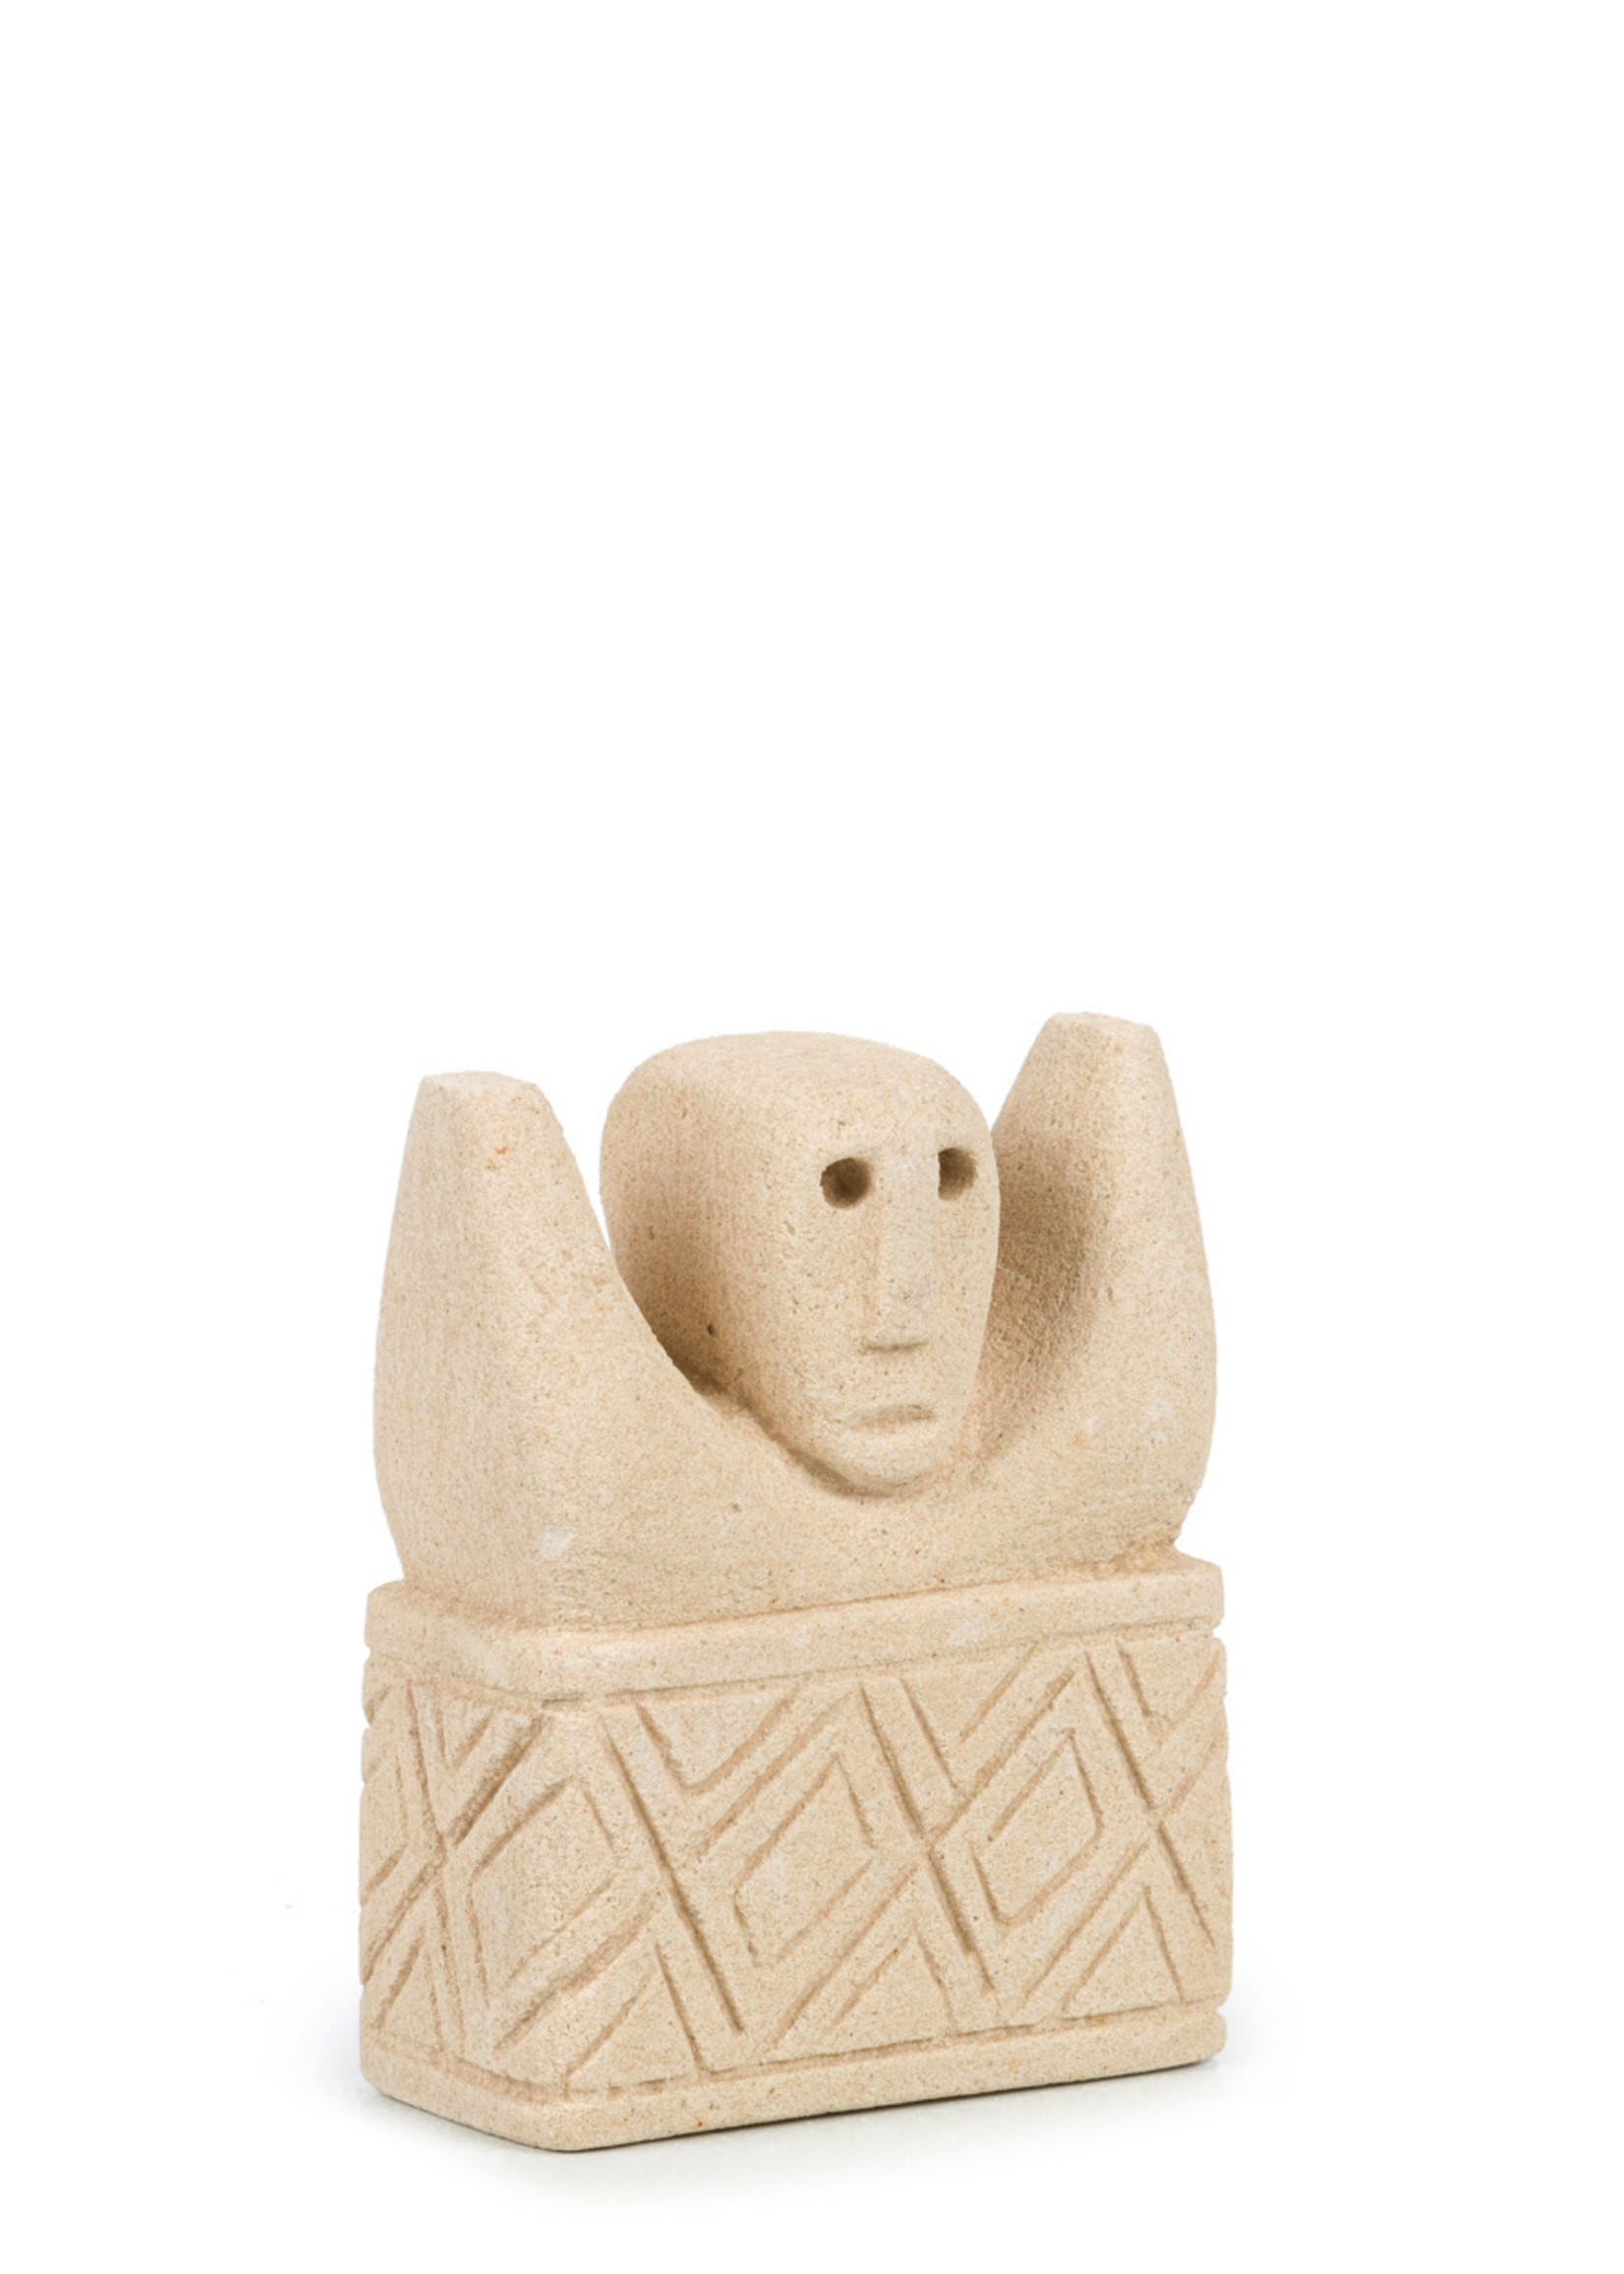 The Sumba Stone #17